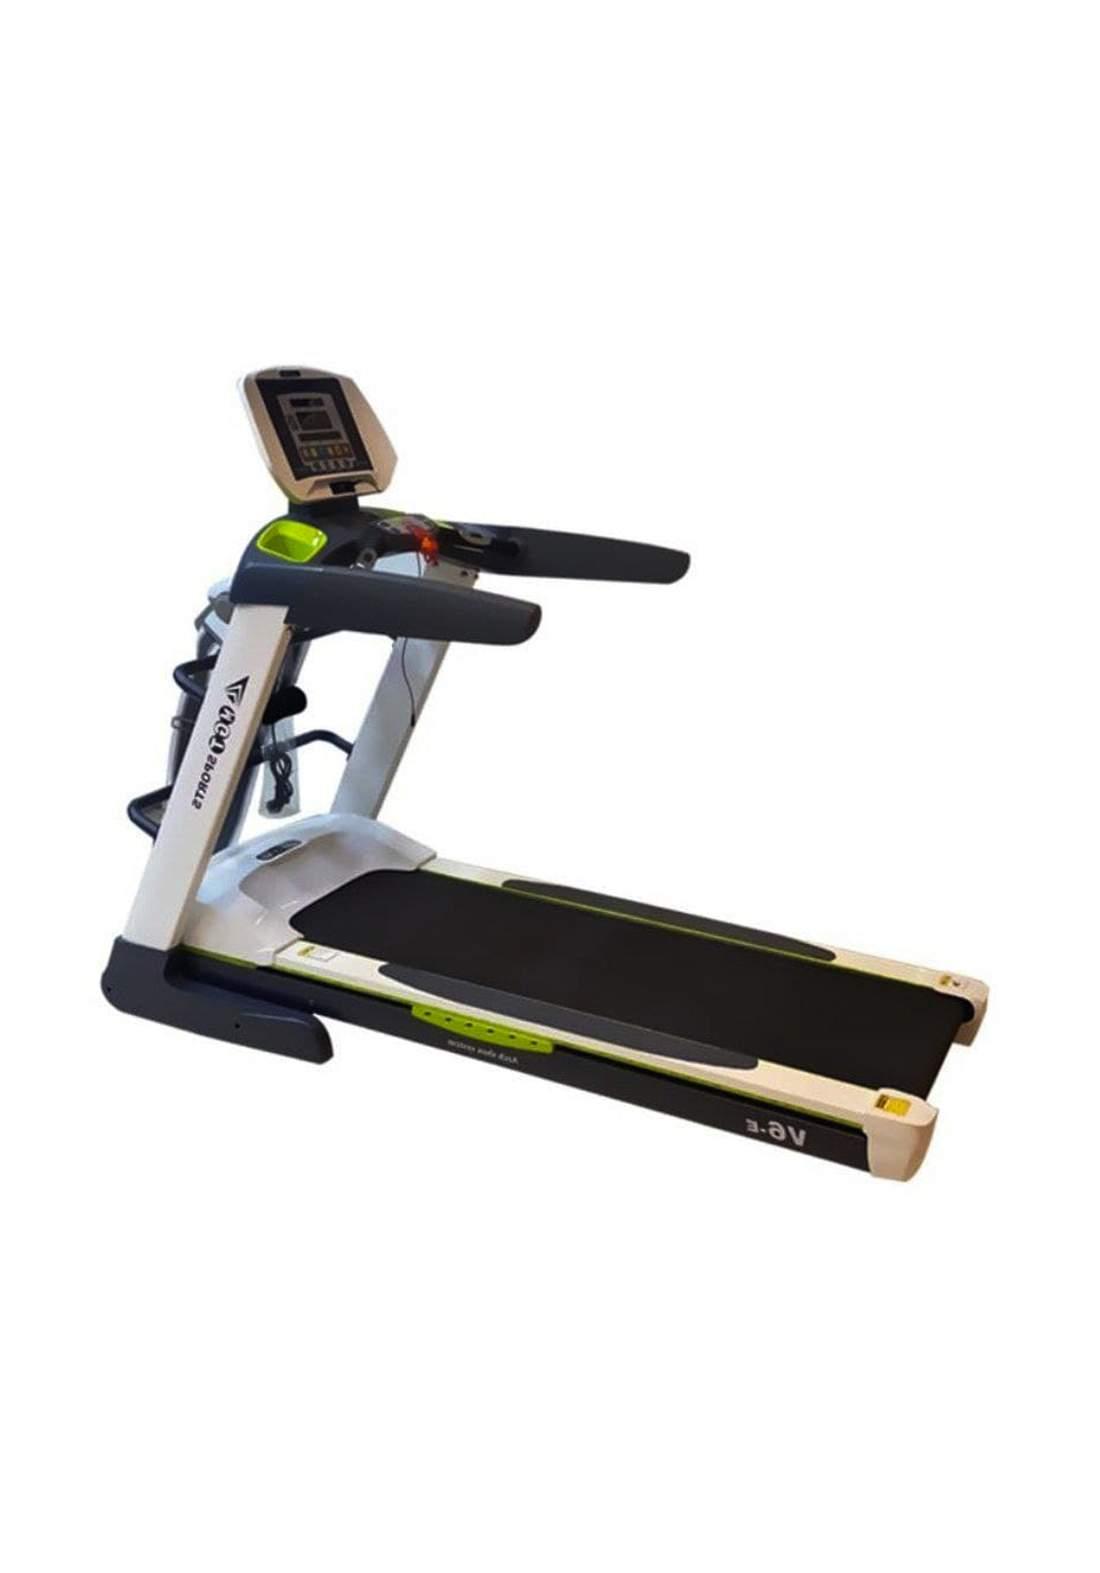 MGT Electric Treadmill جهاز الجري الكهربائي